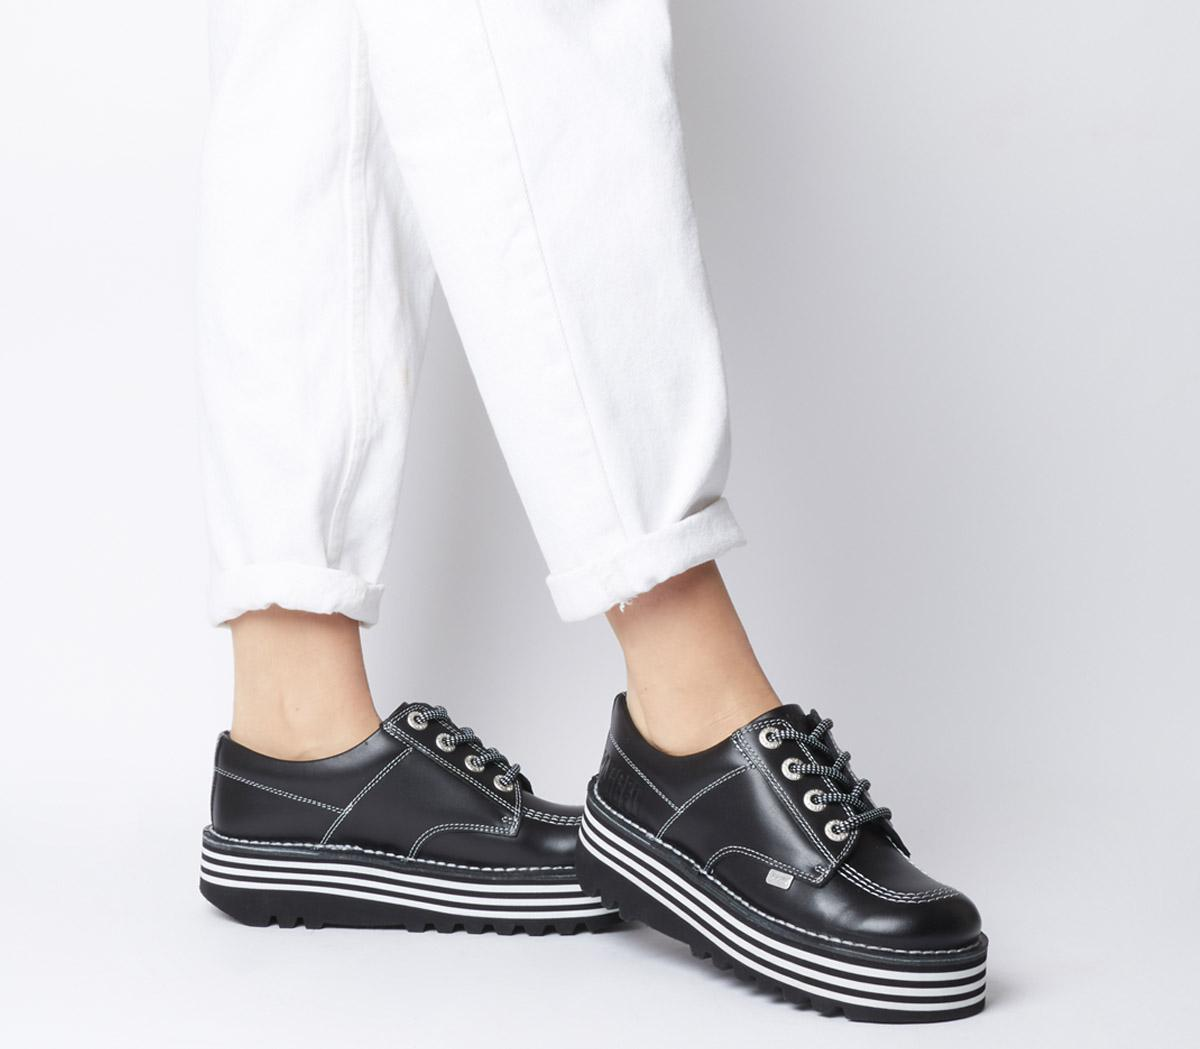 Kick Lo Ragged Shoes